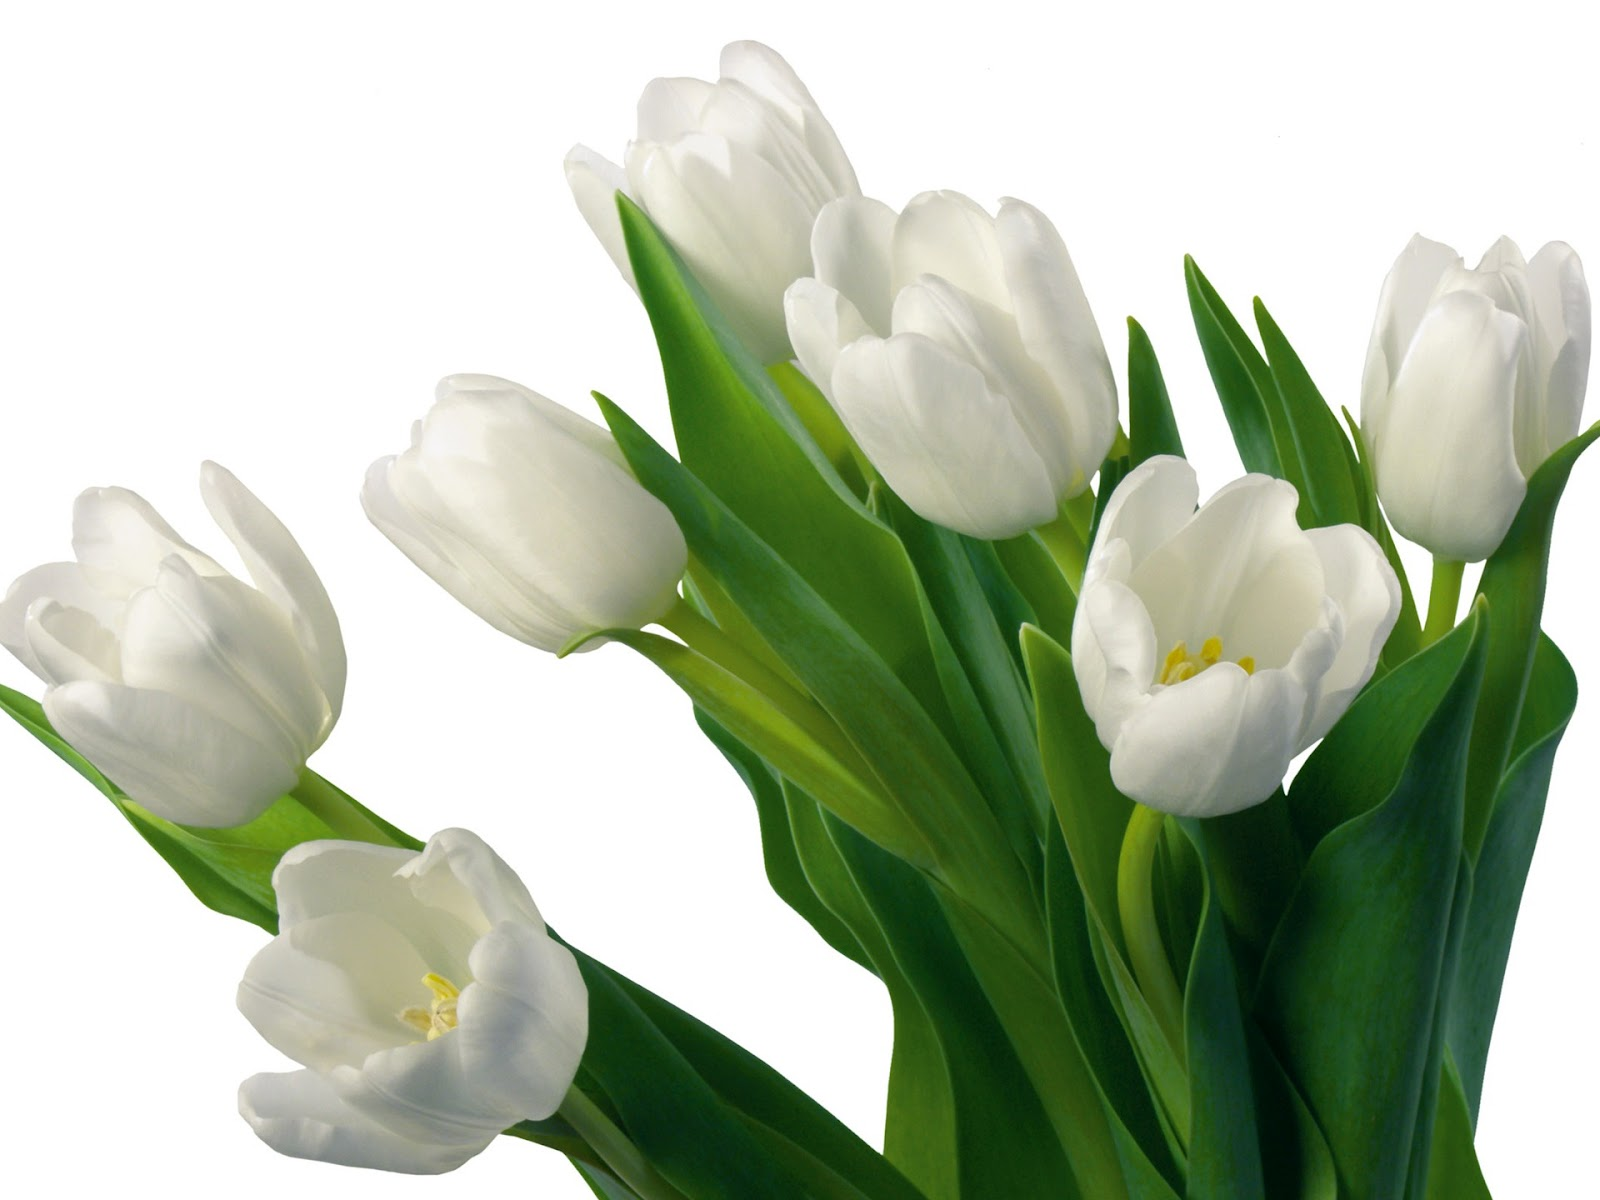 flowers for flower lovers White tulips flowers